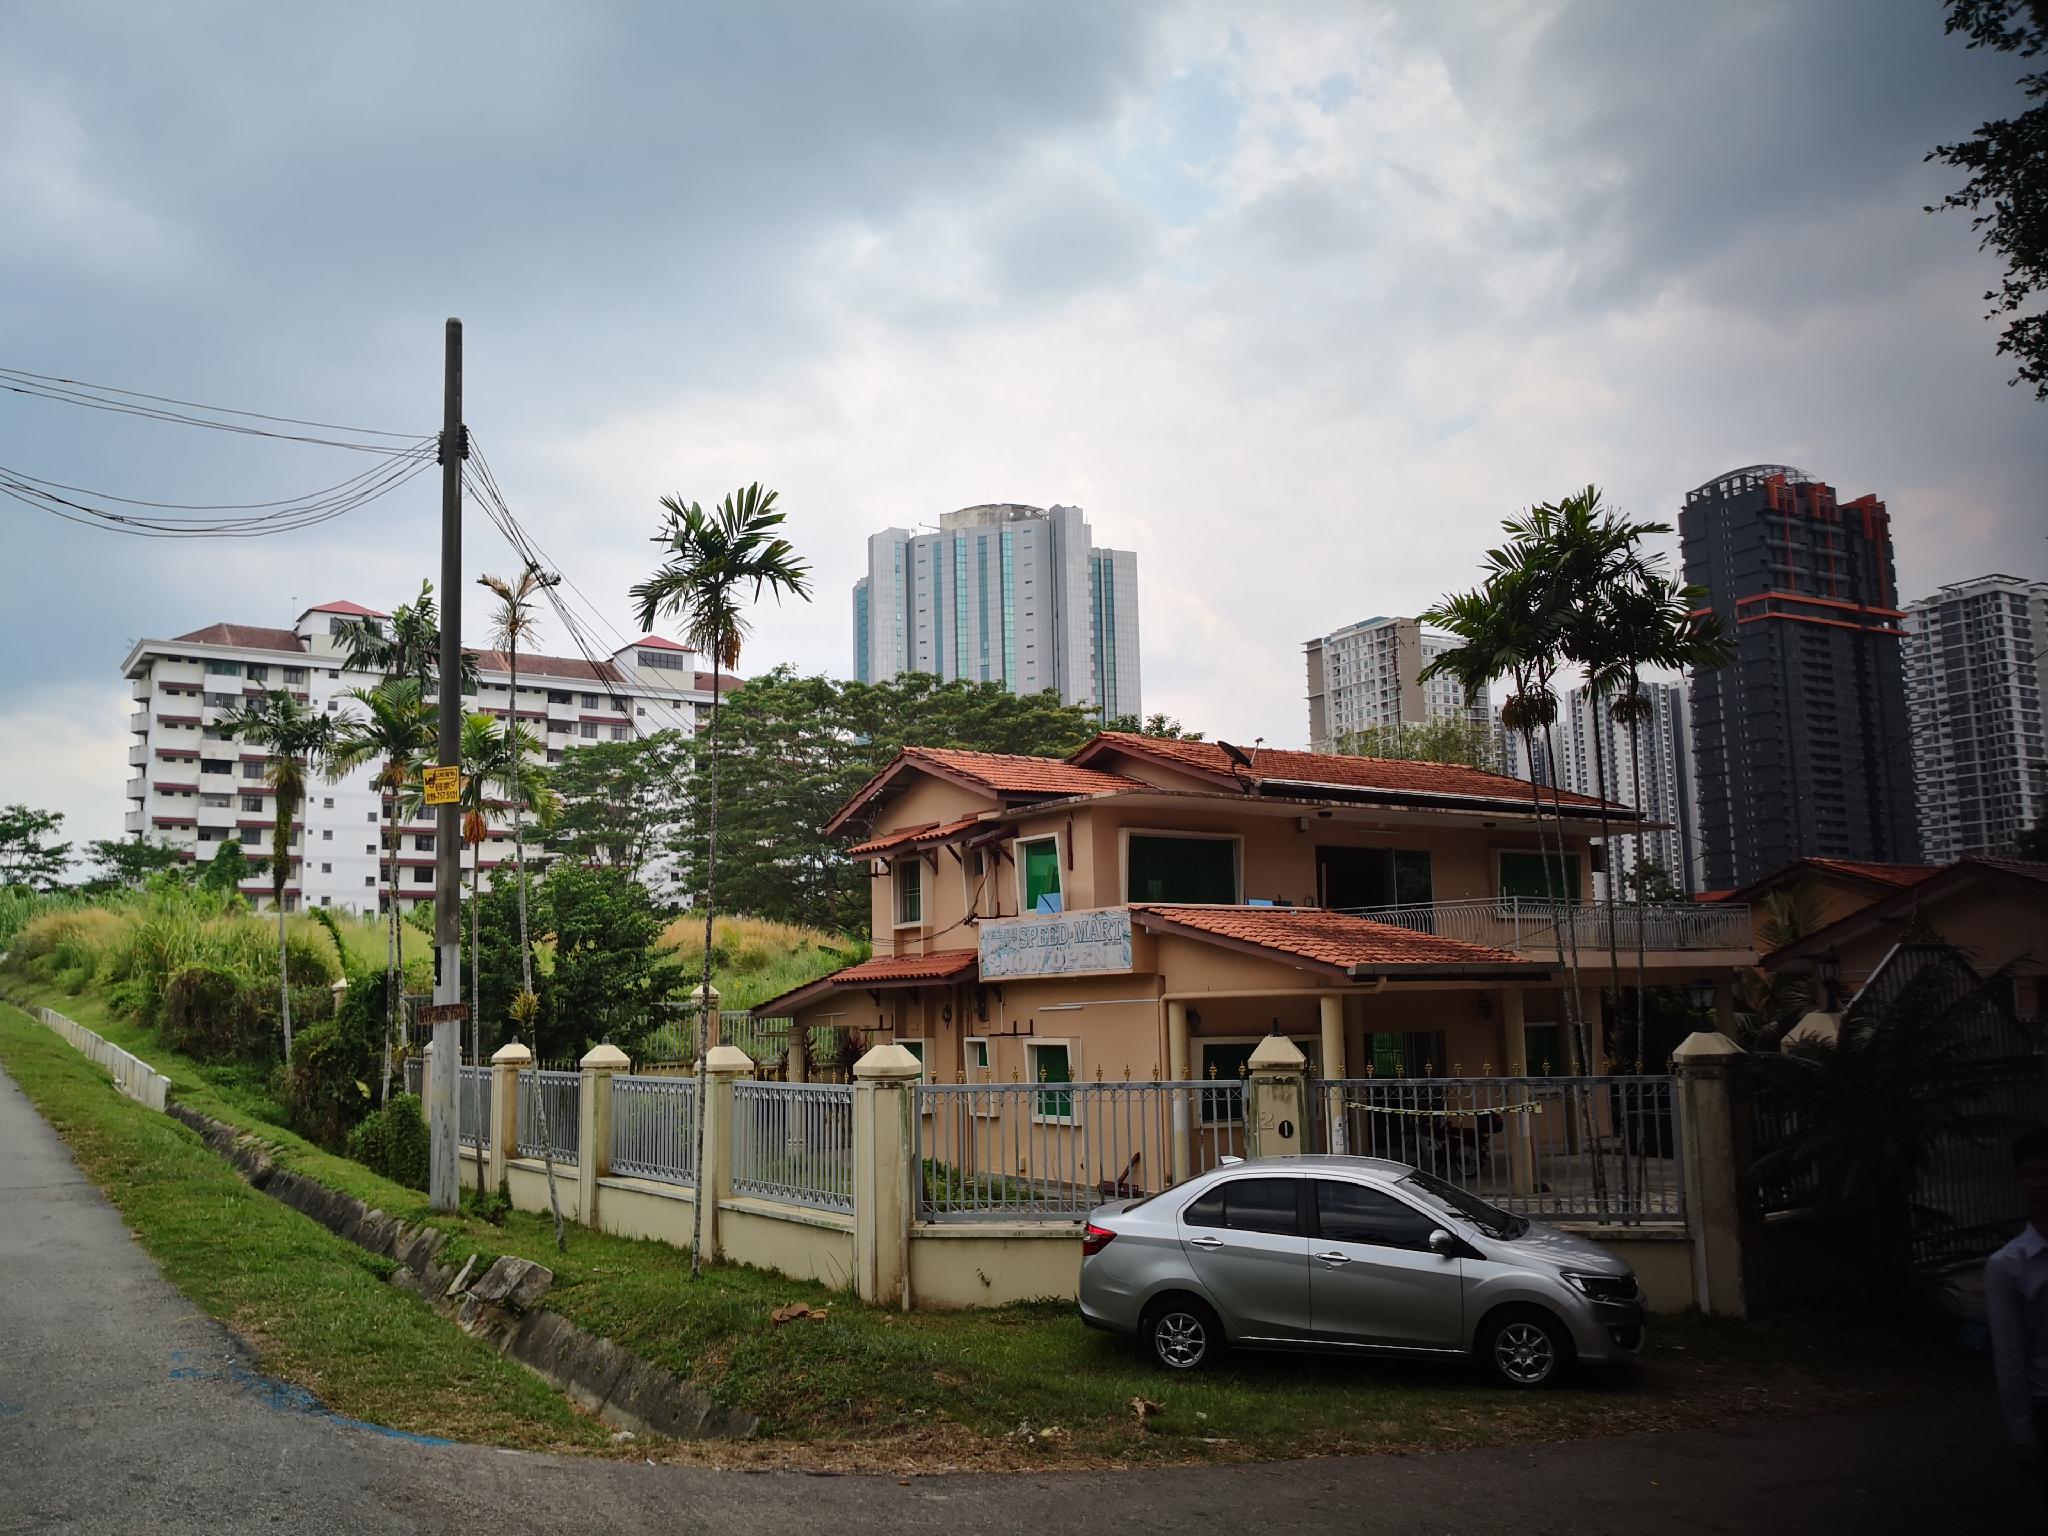 Southern Guest House in Johor bahru 7min to CIQ 16min to Singapore, Johor Bahru